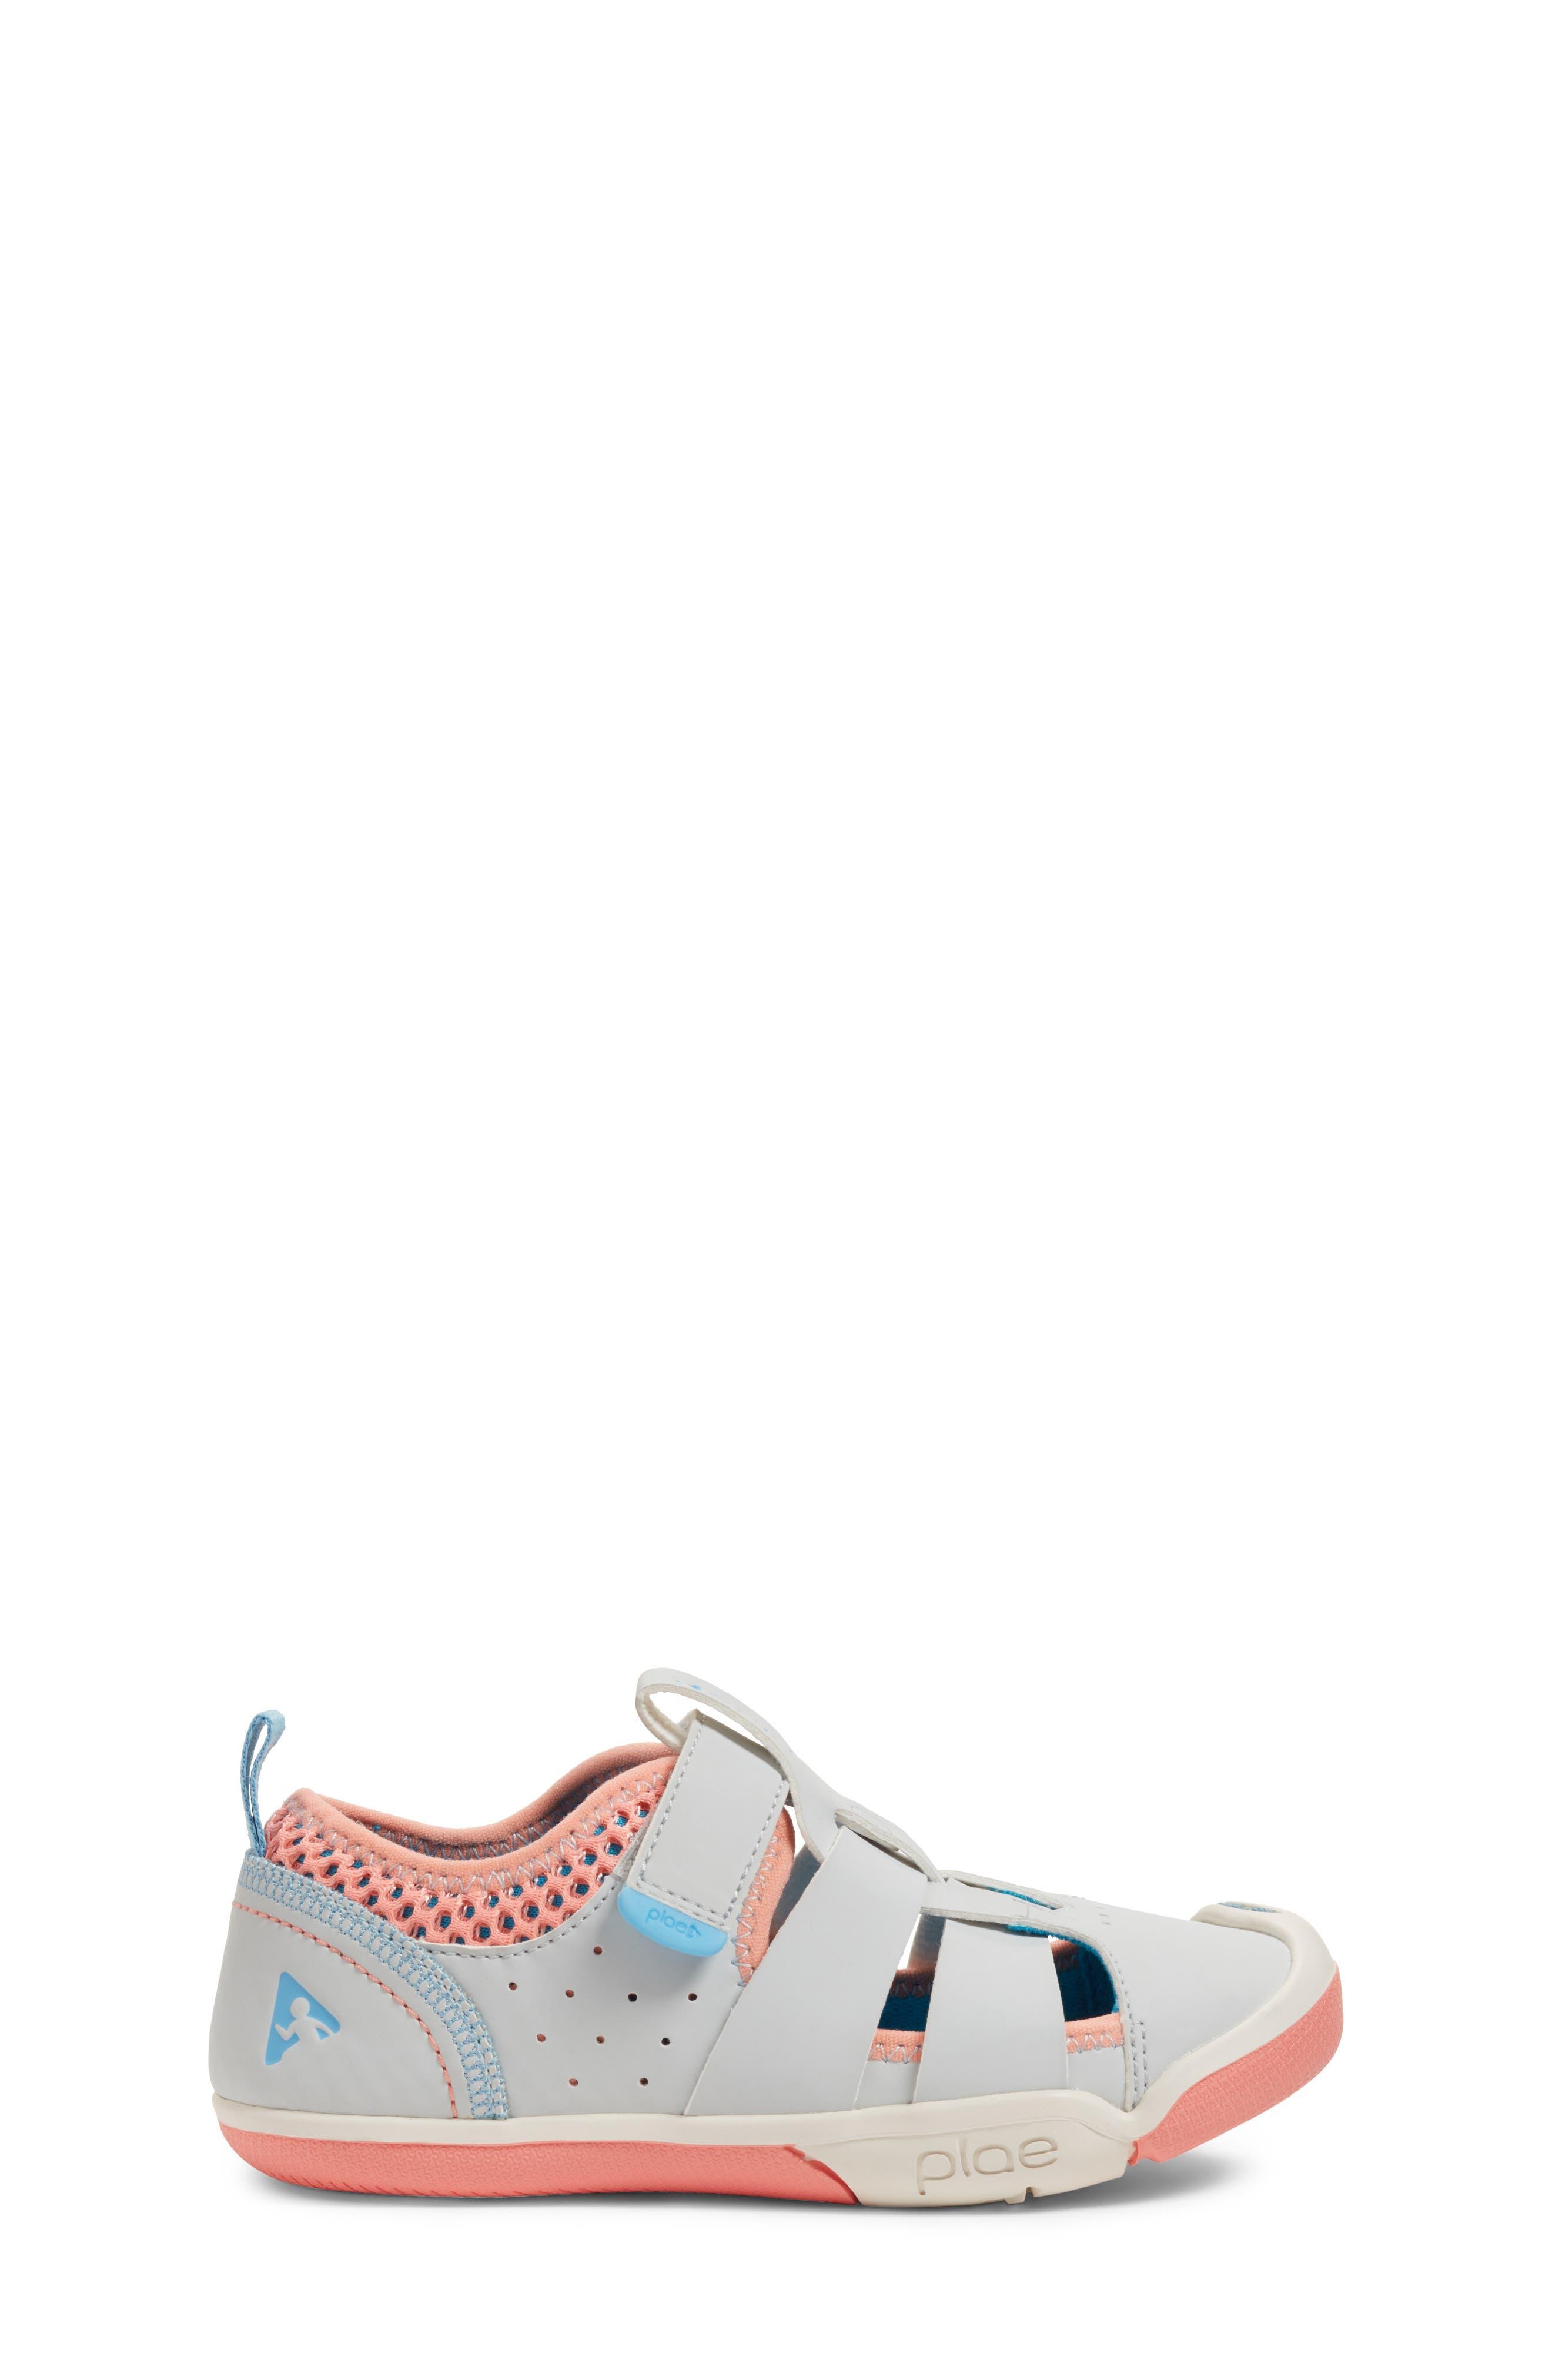 'Sam' Customizable Sneaker,                             Alternate thumbnail 3, color,                             Opal